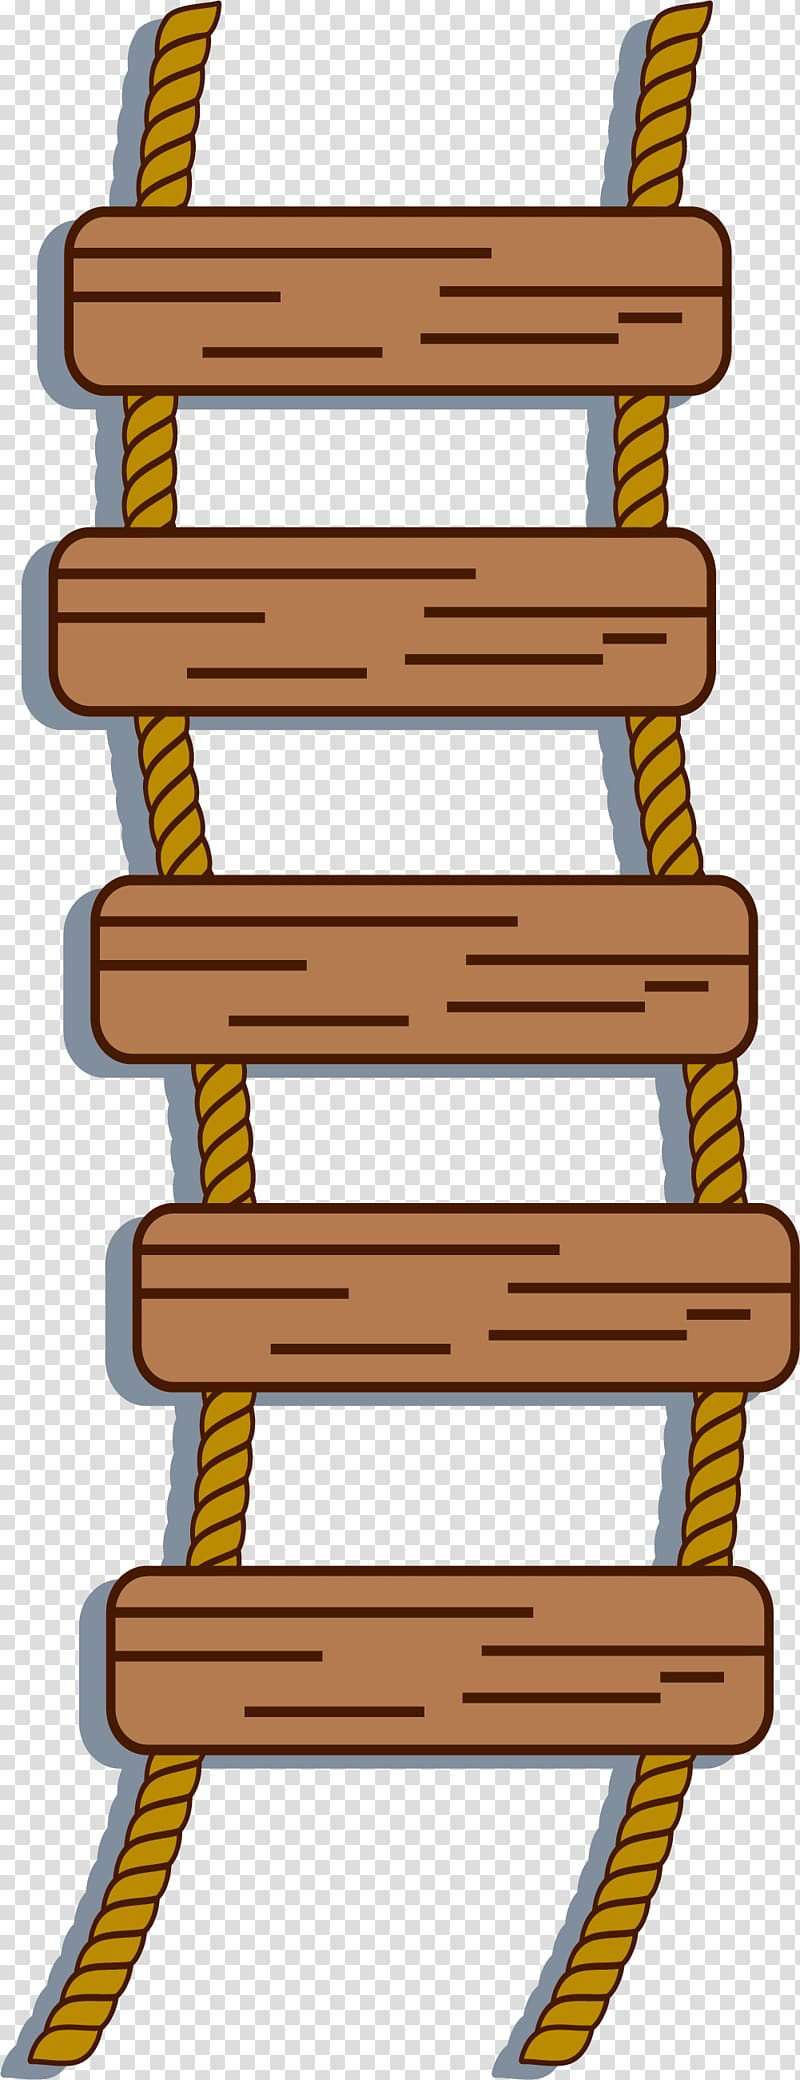 Ladder clipart rope ladder. Transparent background png cliparts